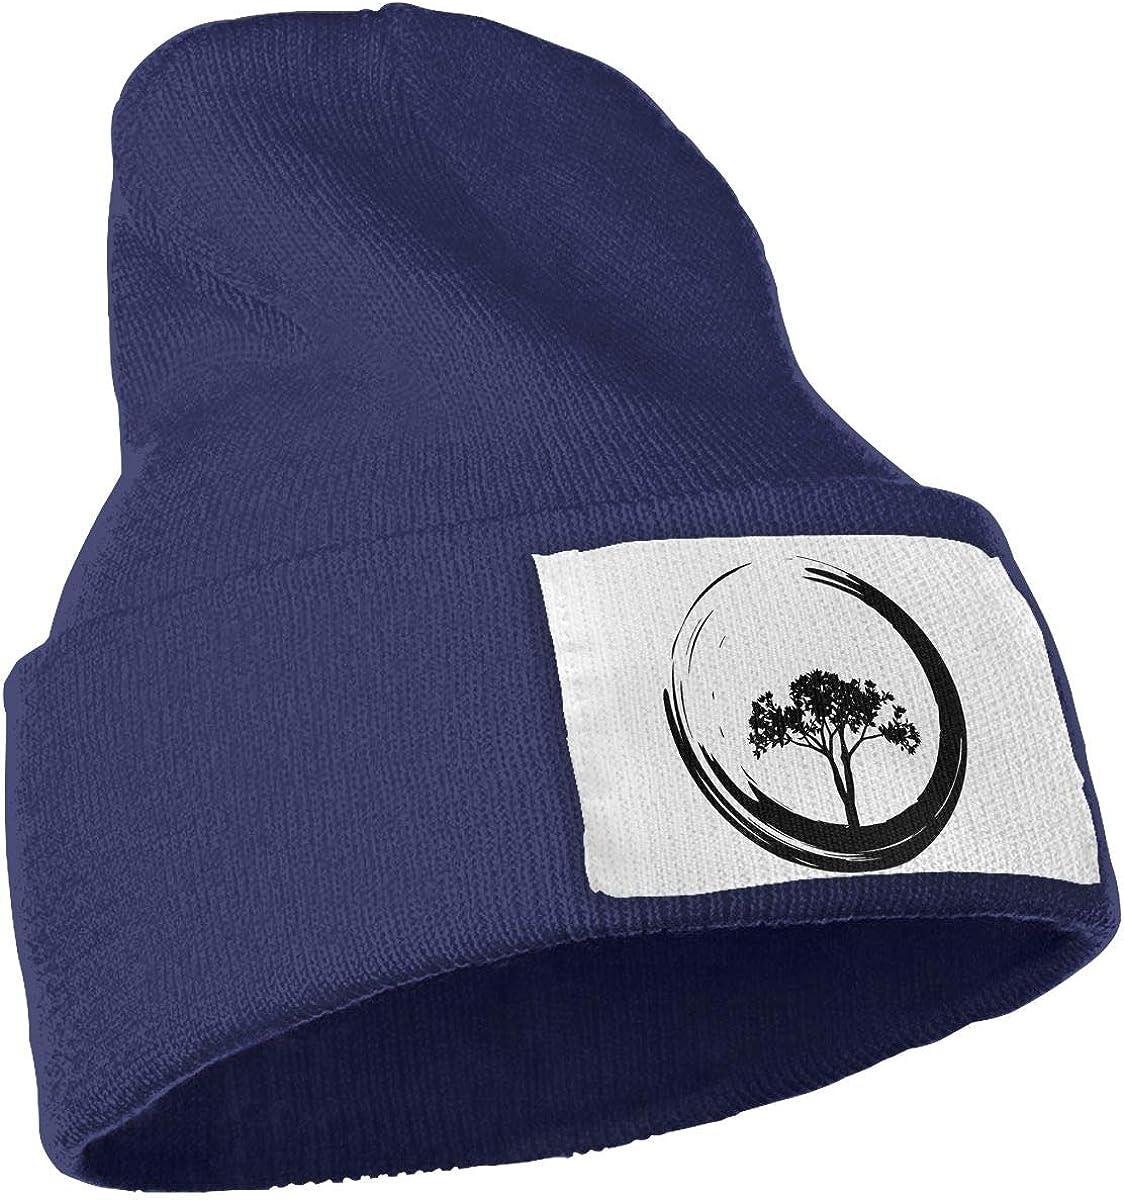 TAOMAP89 Tree and Zen Circle Men /& Women Skull Caps Winter Warm Stretchy Knitting Beanie Hats